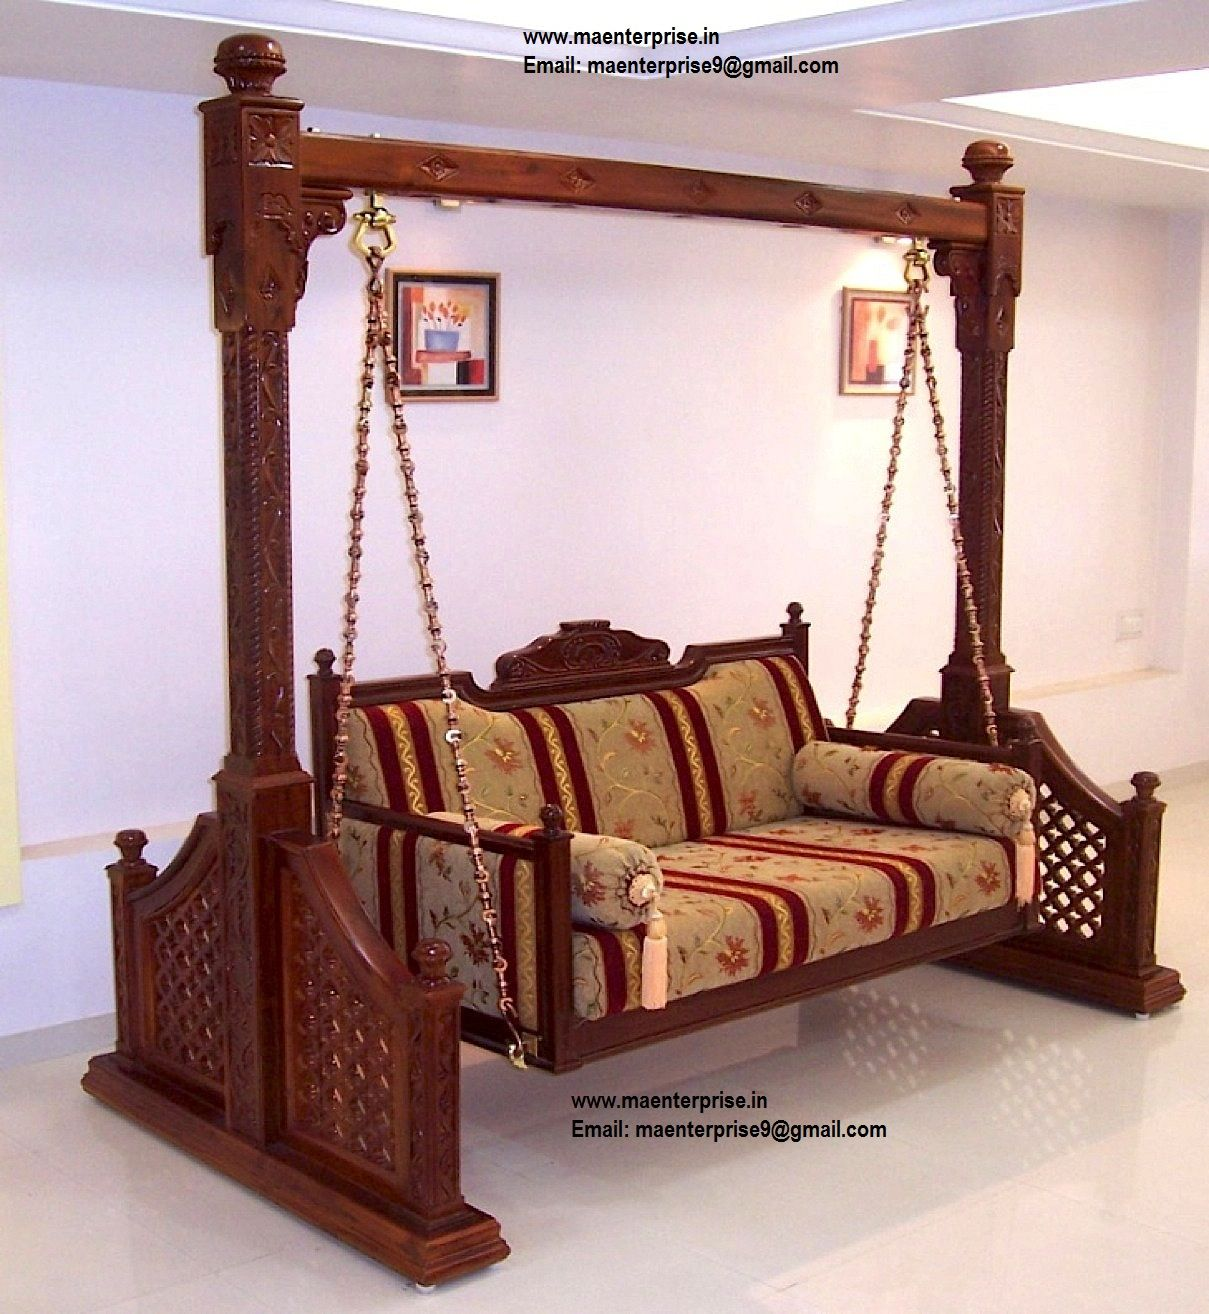 Indian Home Decor Jhoola Swing Decor Home Decor Home Swing